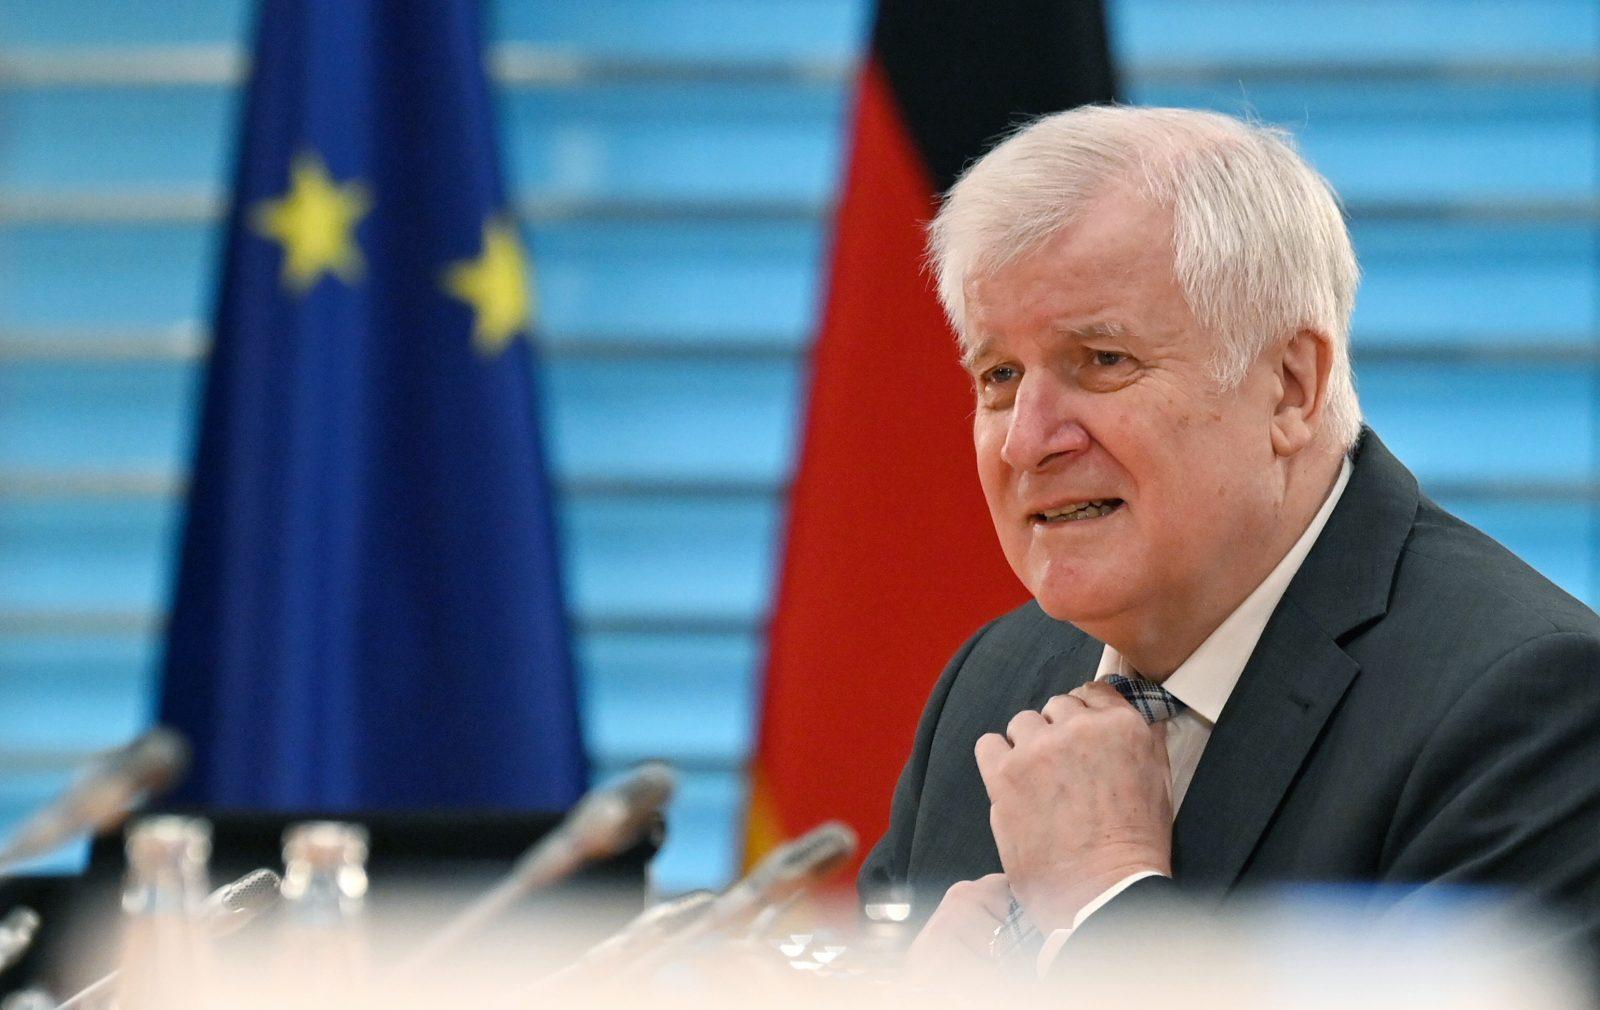 Bundesinnenminister Horst Seehofer (CSU) sagte die Aufnahme von 150 Kindern aus dem Flüchtlingslager Moria zu Foto: picture alliance/John Macdougall/AFP POOL/dpa